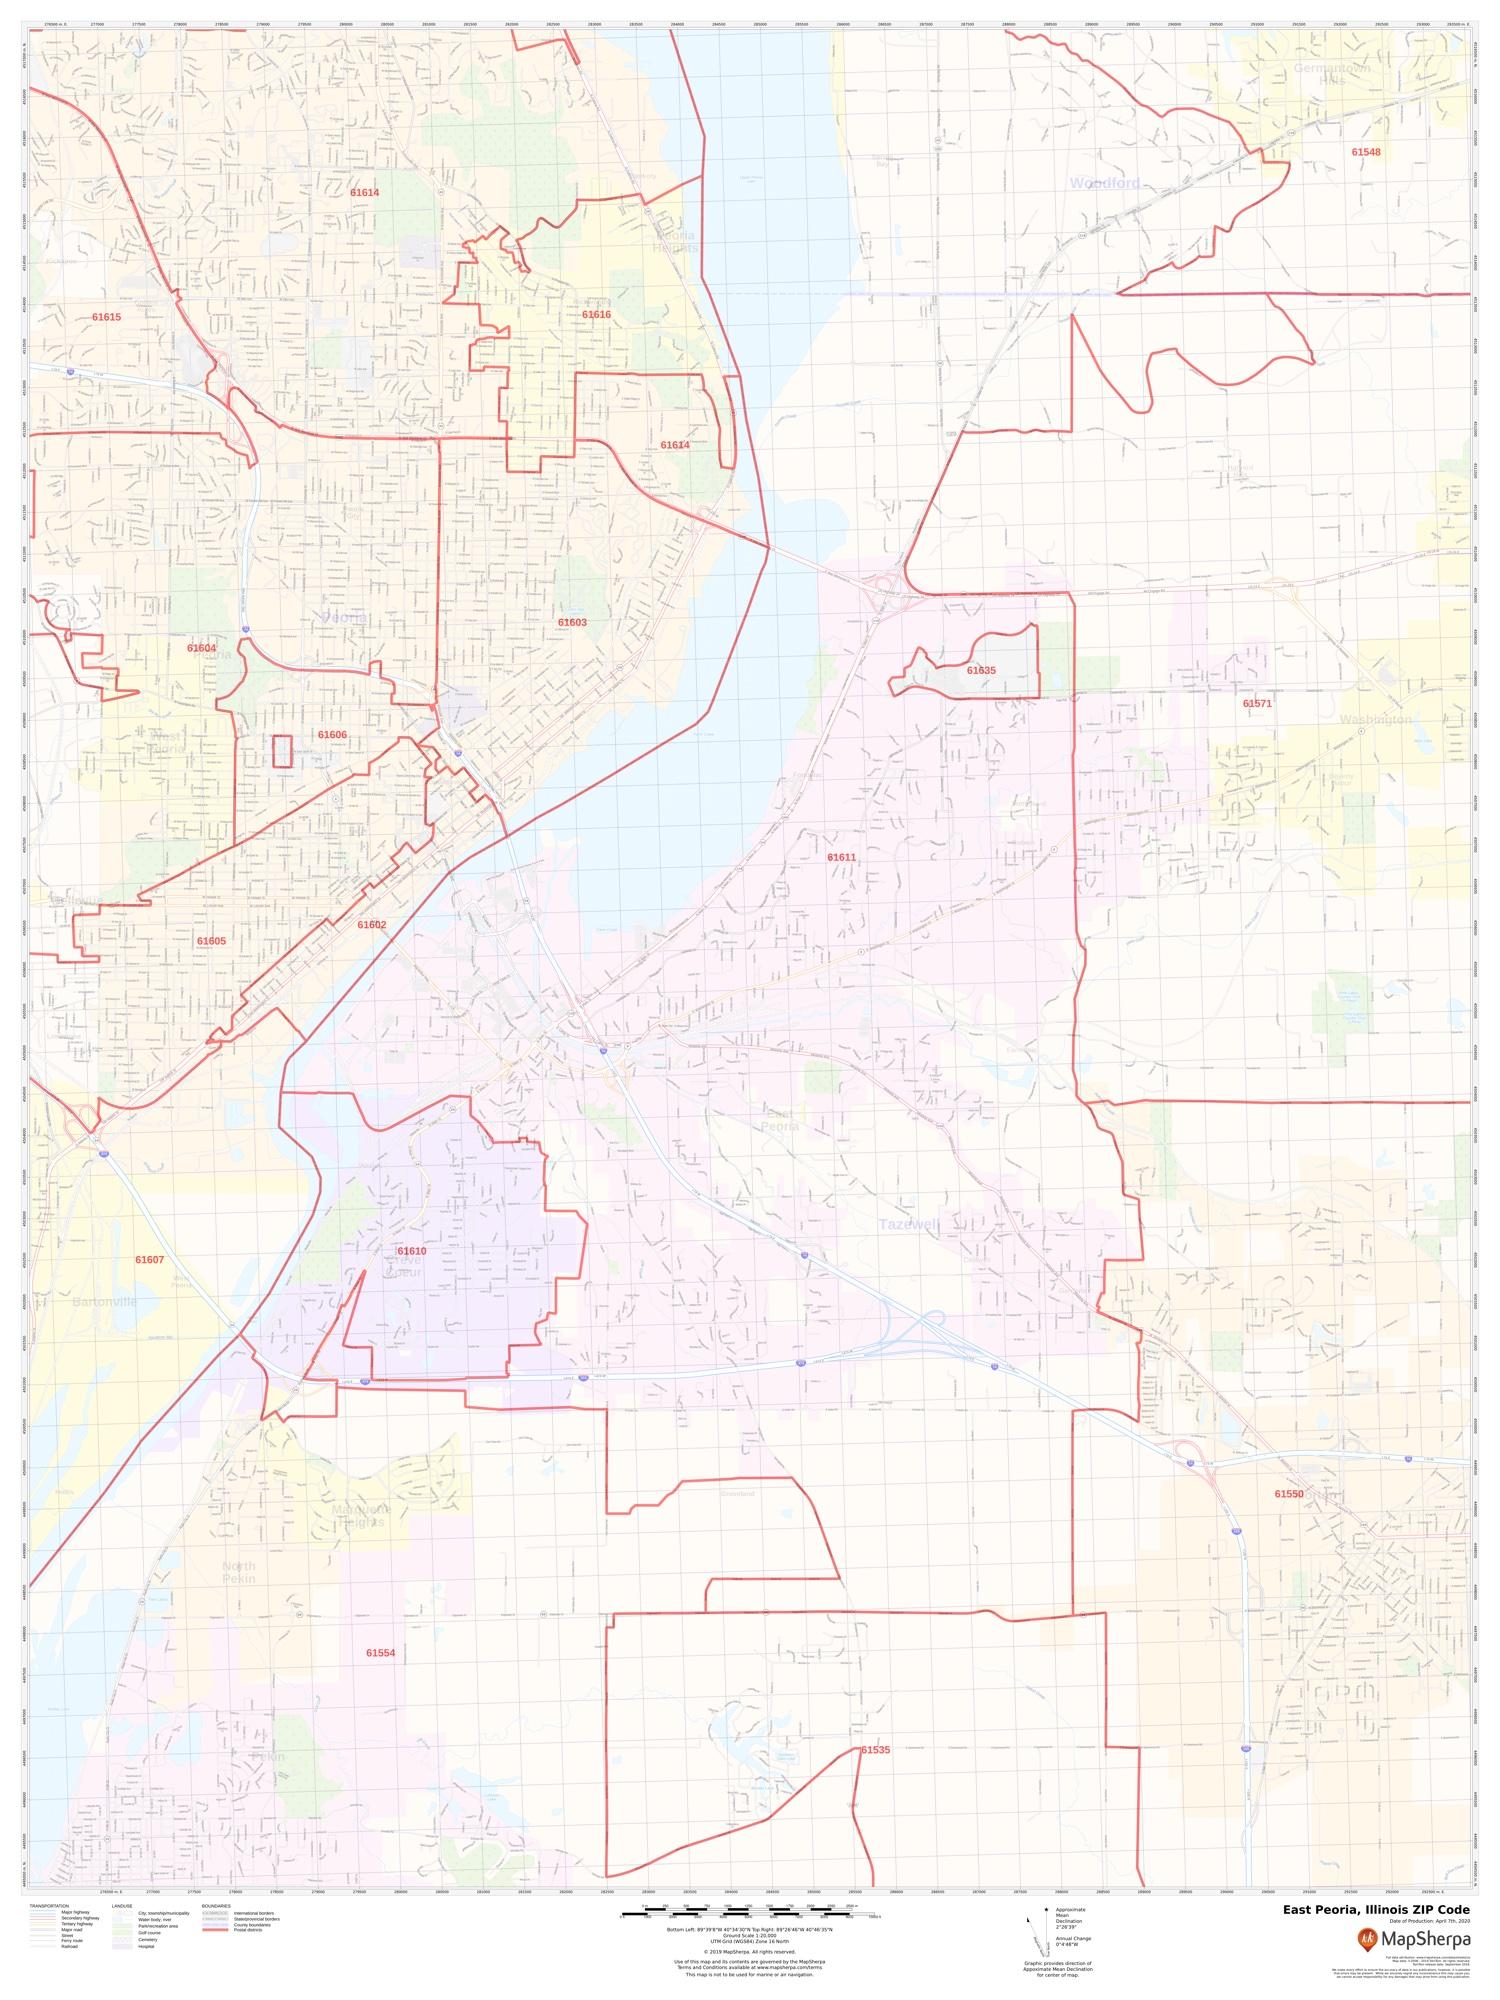 East Peoria Zip Code Map East Peoria Zip Code Map